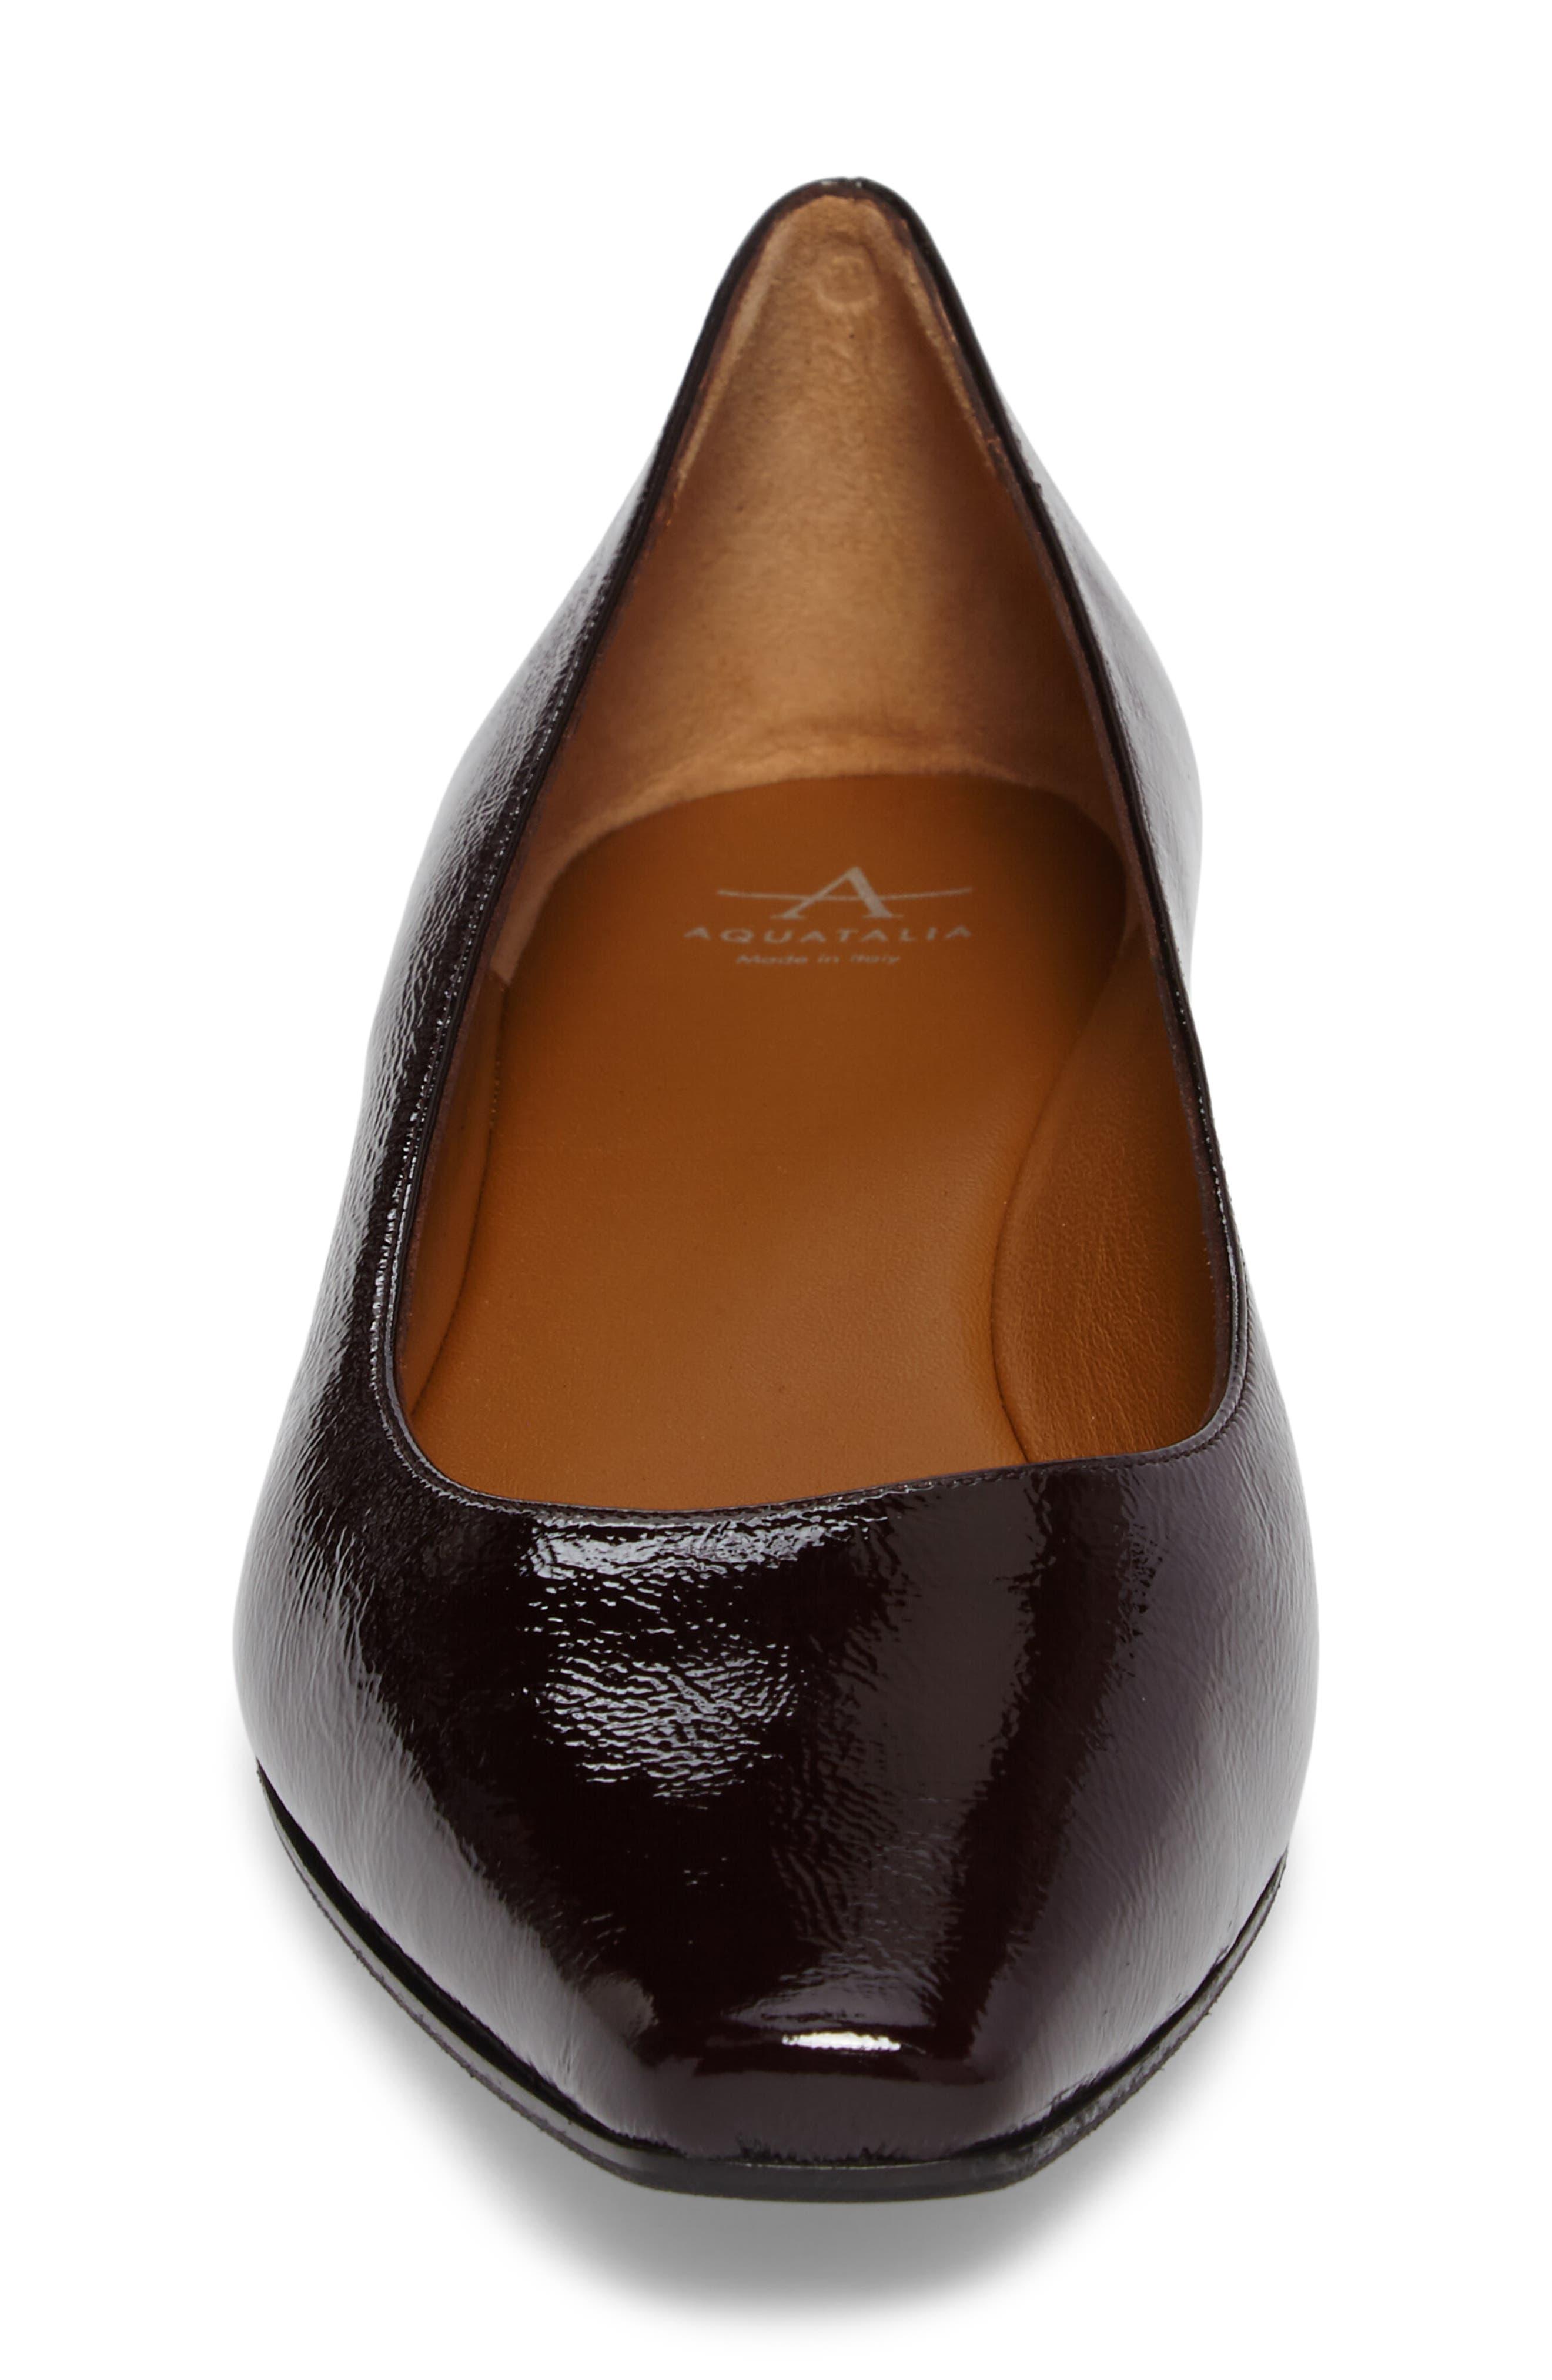 Marcella Weatherproof Leather Flat,                             Alternate thumbnail 4, color,                             Wine